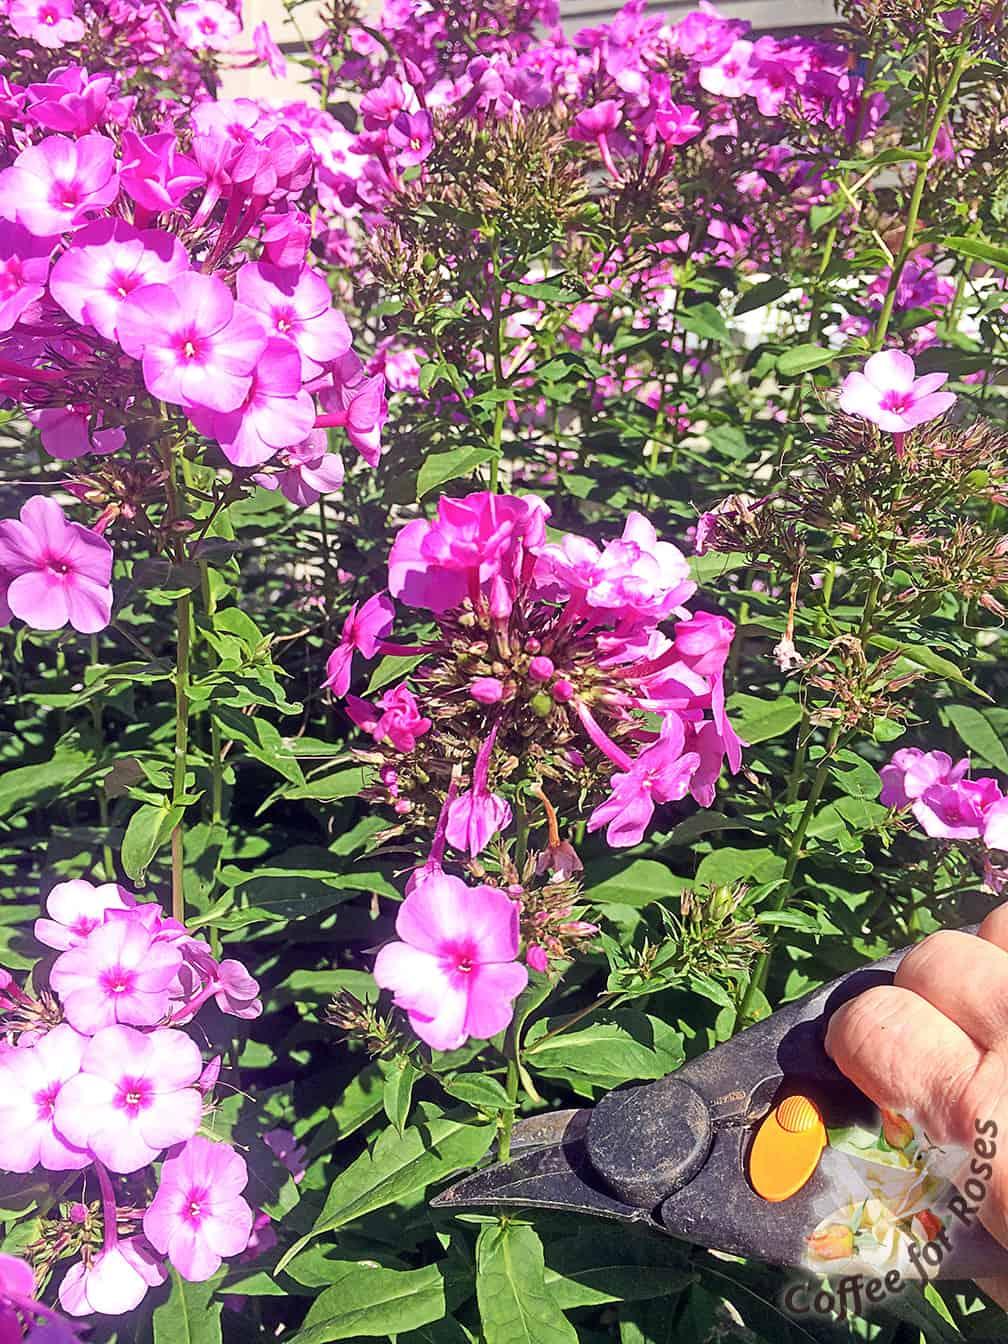 High To Deadhead Phlox You Clip Just Below Declining Flower Or Seed Coffee Roses Deadheading Summer Phlox How To Deadhead Roses Rhs How To Deadhead Roses After Bloom houzz-03 How To Deadhead Roses